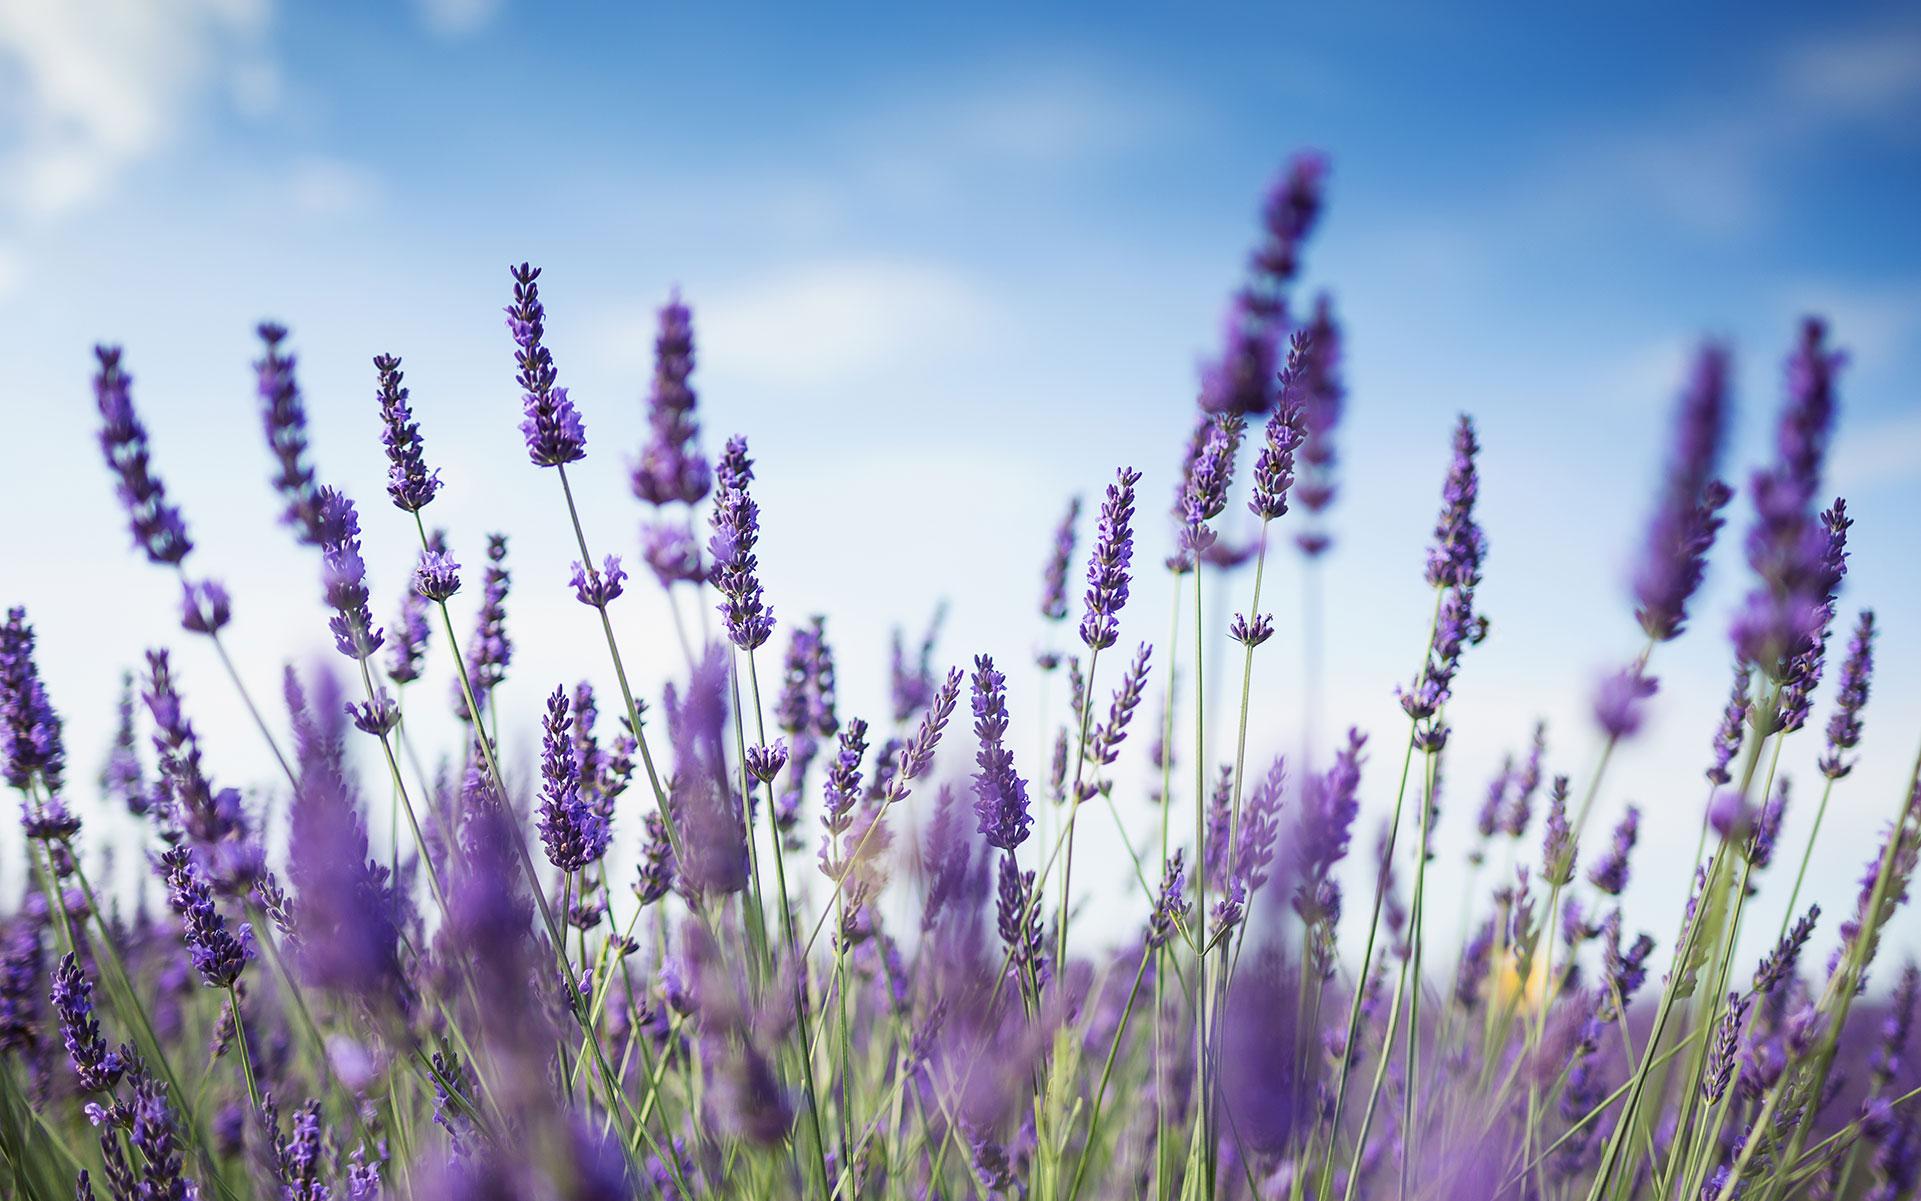 cannabis strains with floral flavors, linalool cultivar